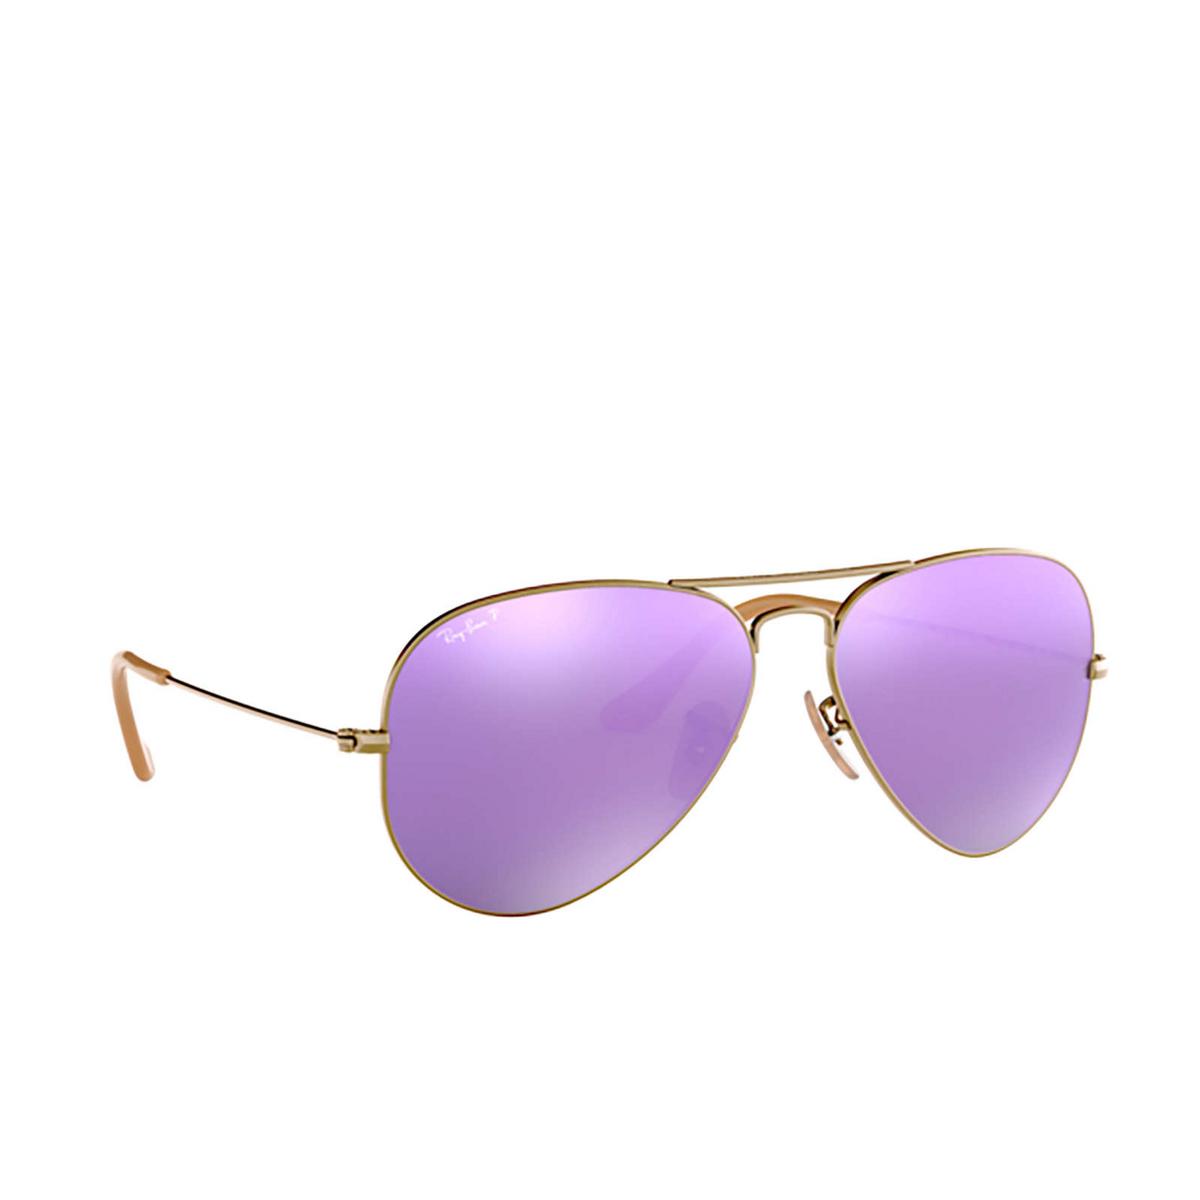 Ray-Ban® Aviator Sunglasses: Aviator Large Metal RB3025 color Demi Gloss Brushed Bronze 167/1R - three-quarters view.